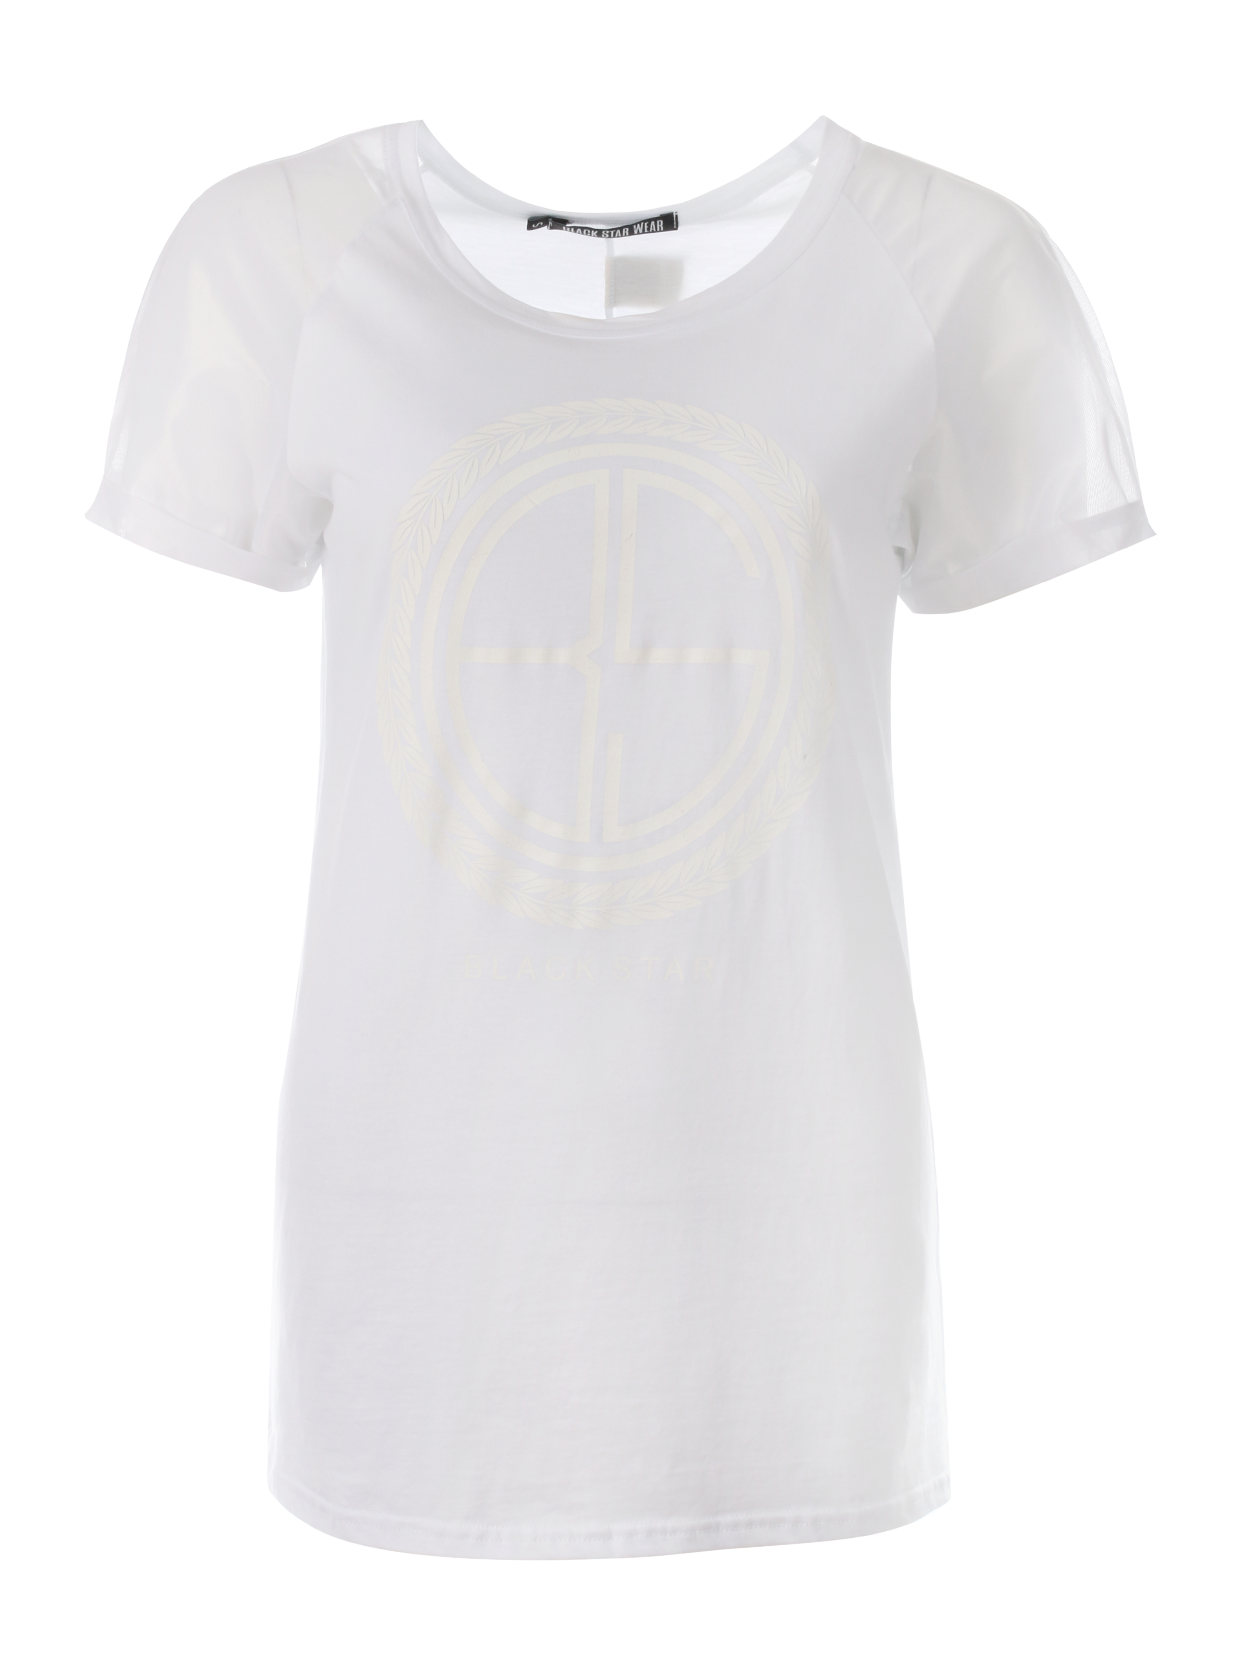 Womens t-shirt Grid